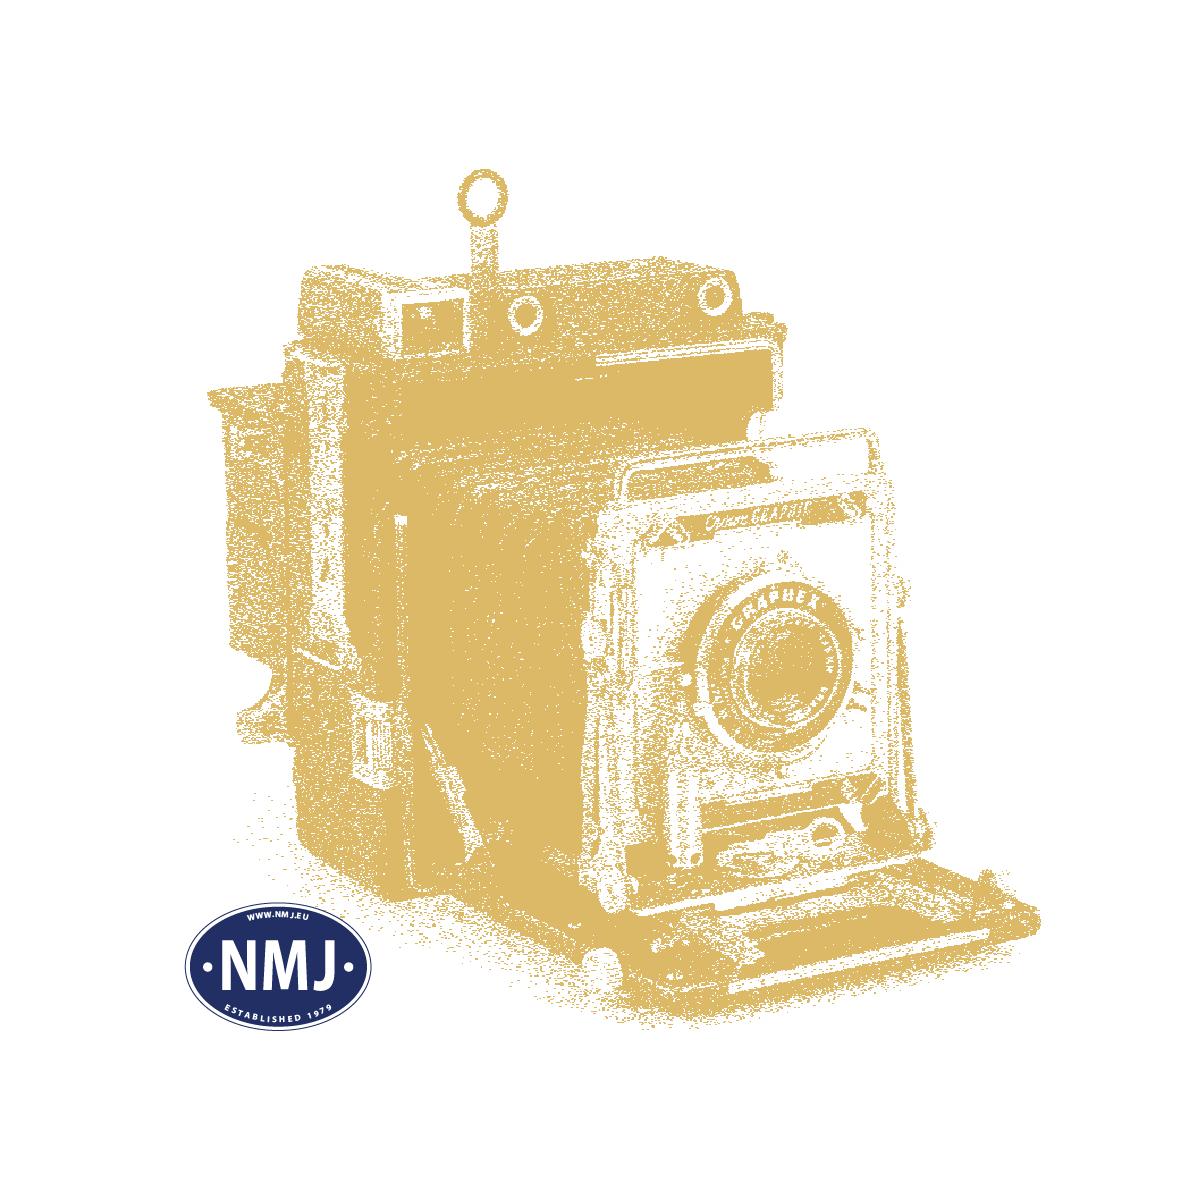 MIG0011 - RAL 7028 Dunkelgelb Aus '44 Dg I, Akrylmaling (17 ml)